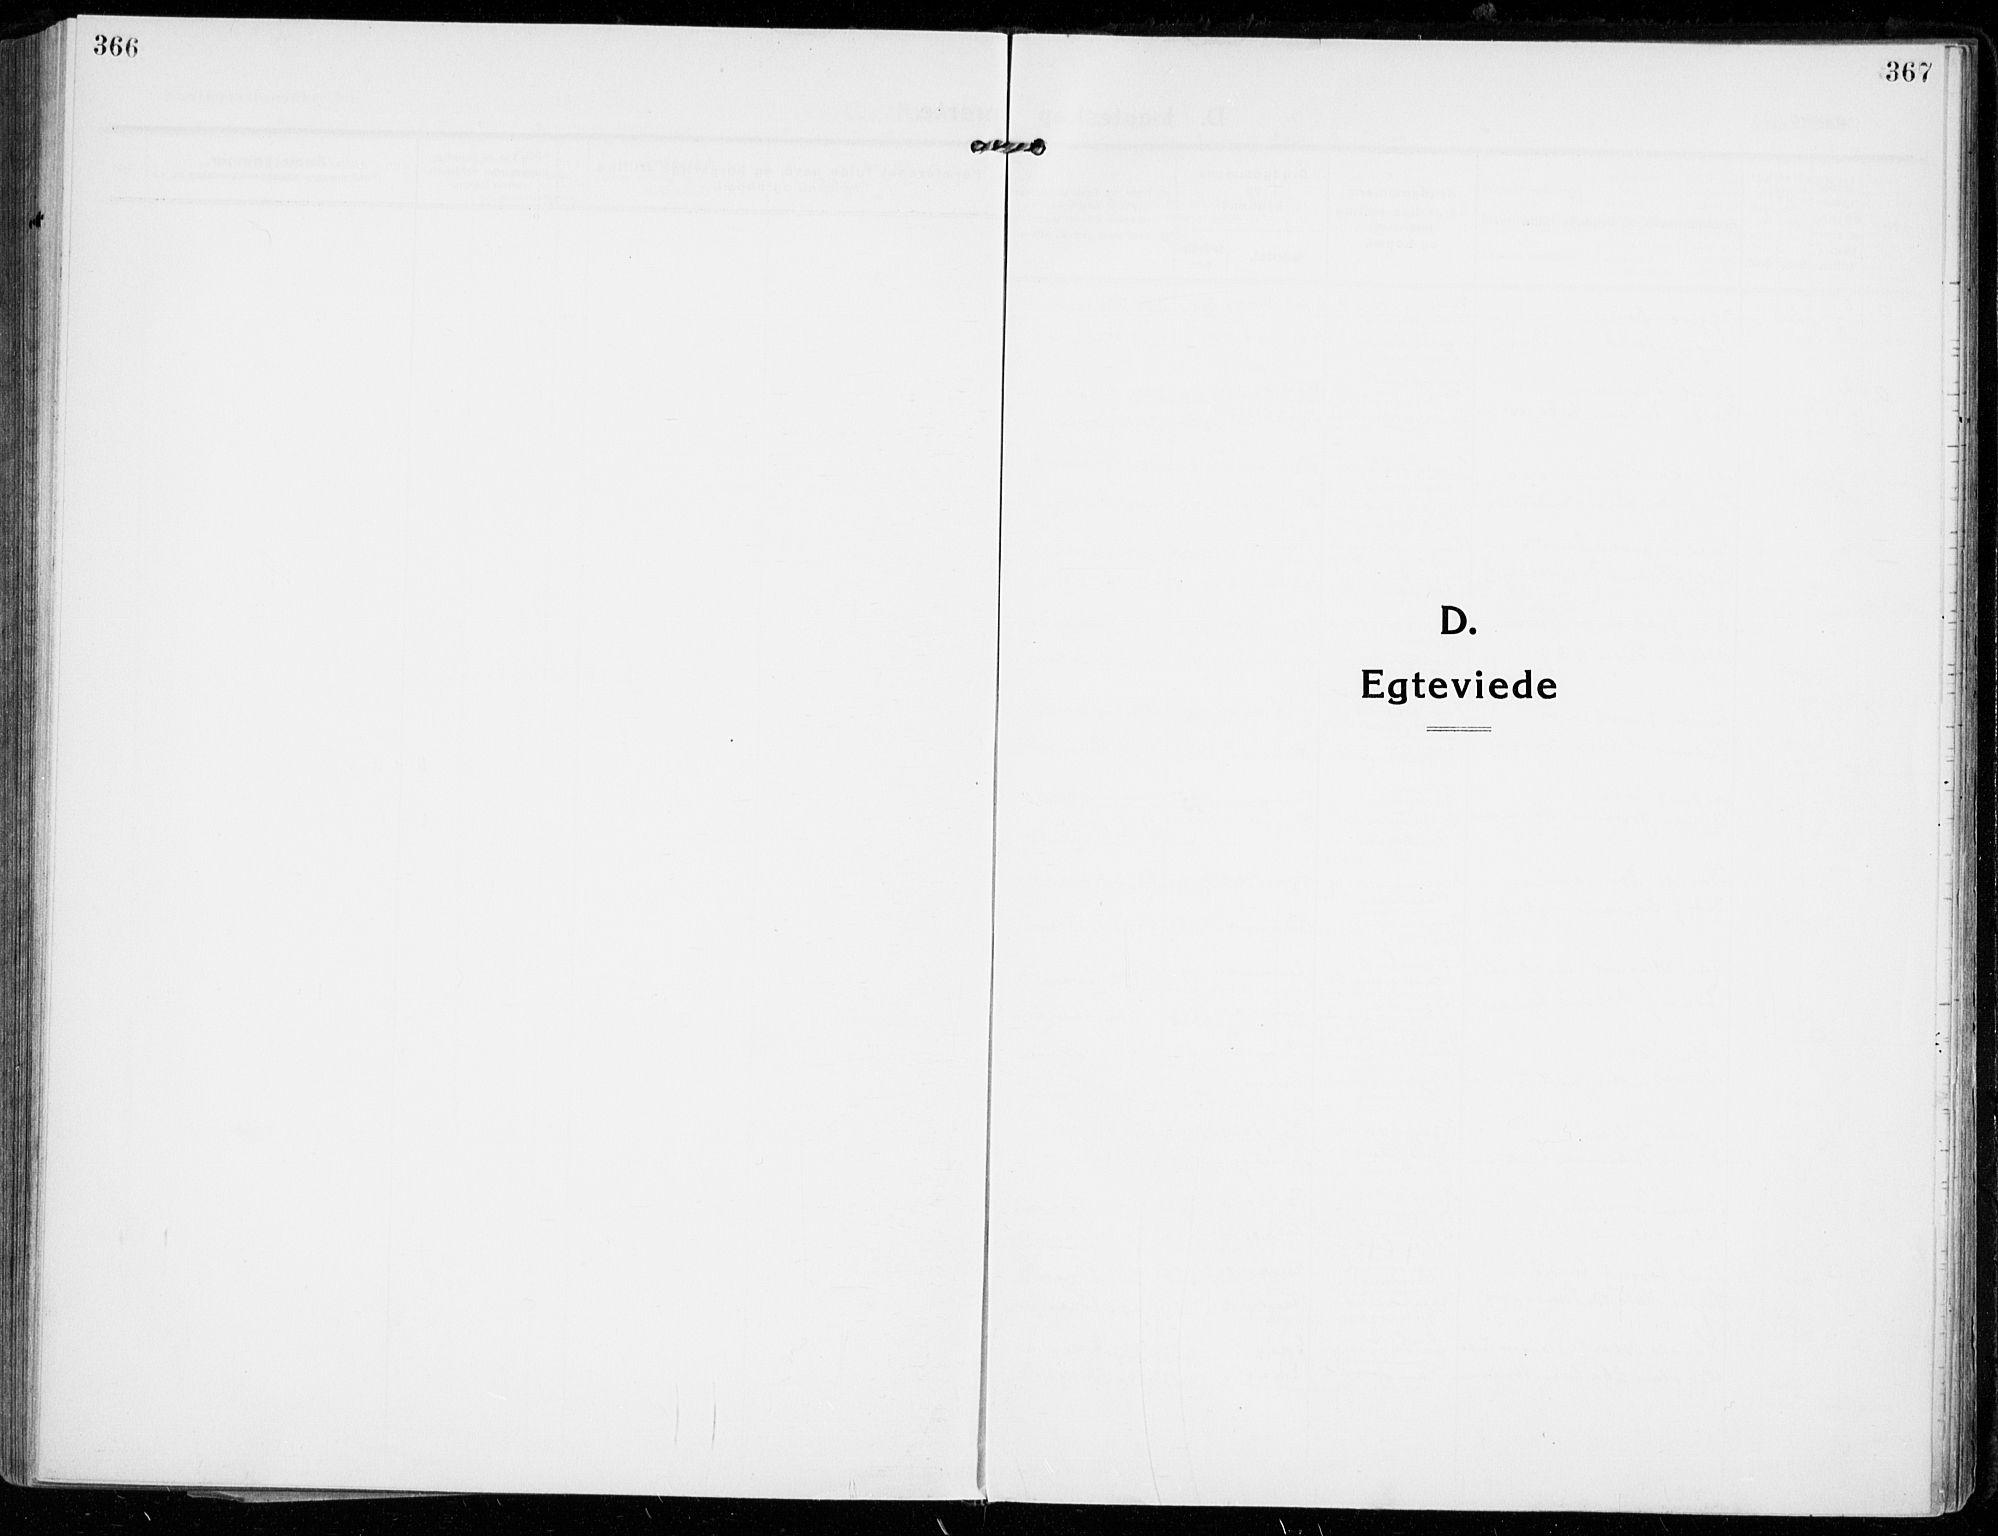 SAKO, Strømsgodset kirkebøker, F/Fa/L0002: Parish register (official) no. 2, 1910-1920, p. 366-367